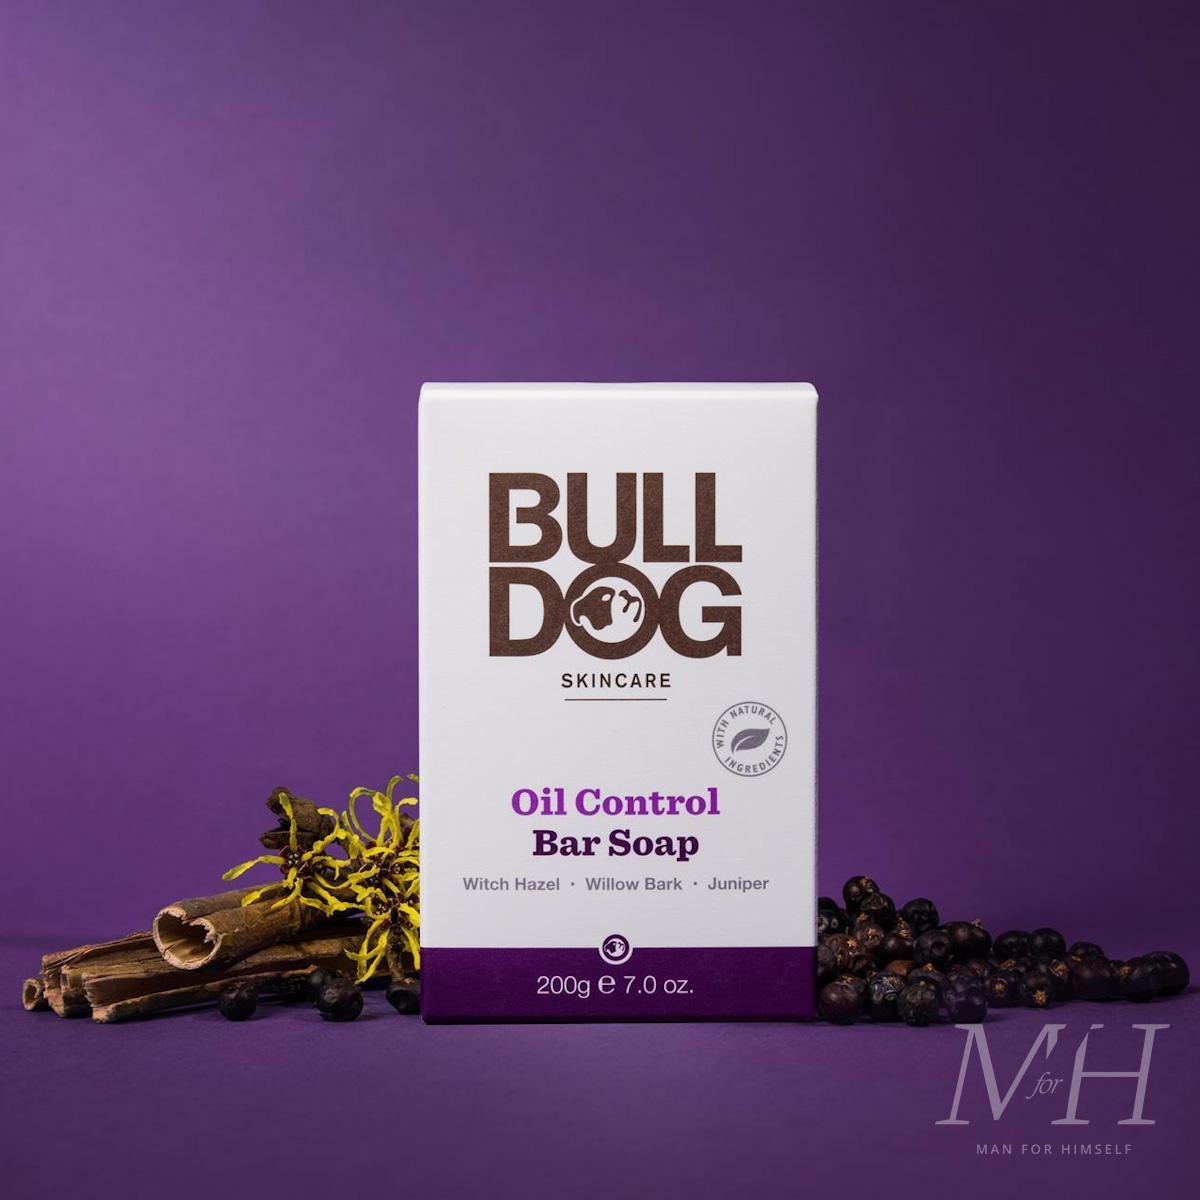 bulldog-skincare-bar-soap-oil-payday-pickups-man-for-himself